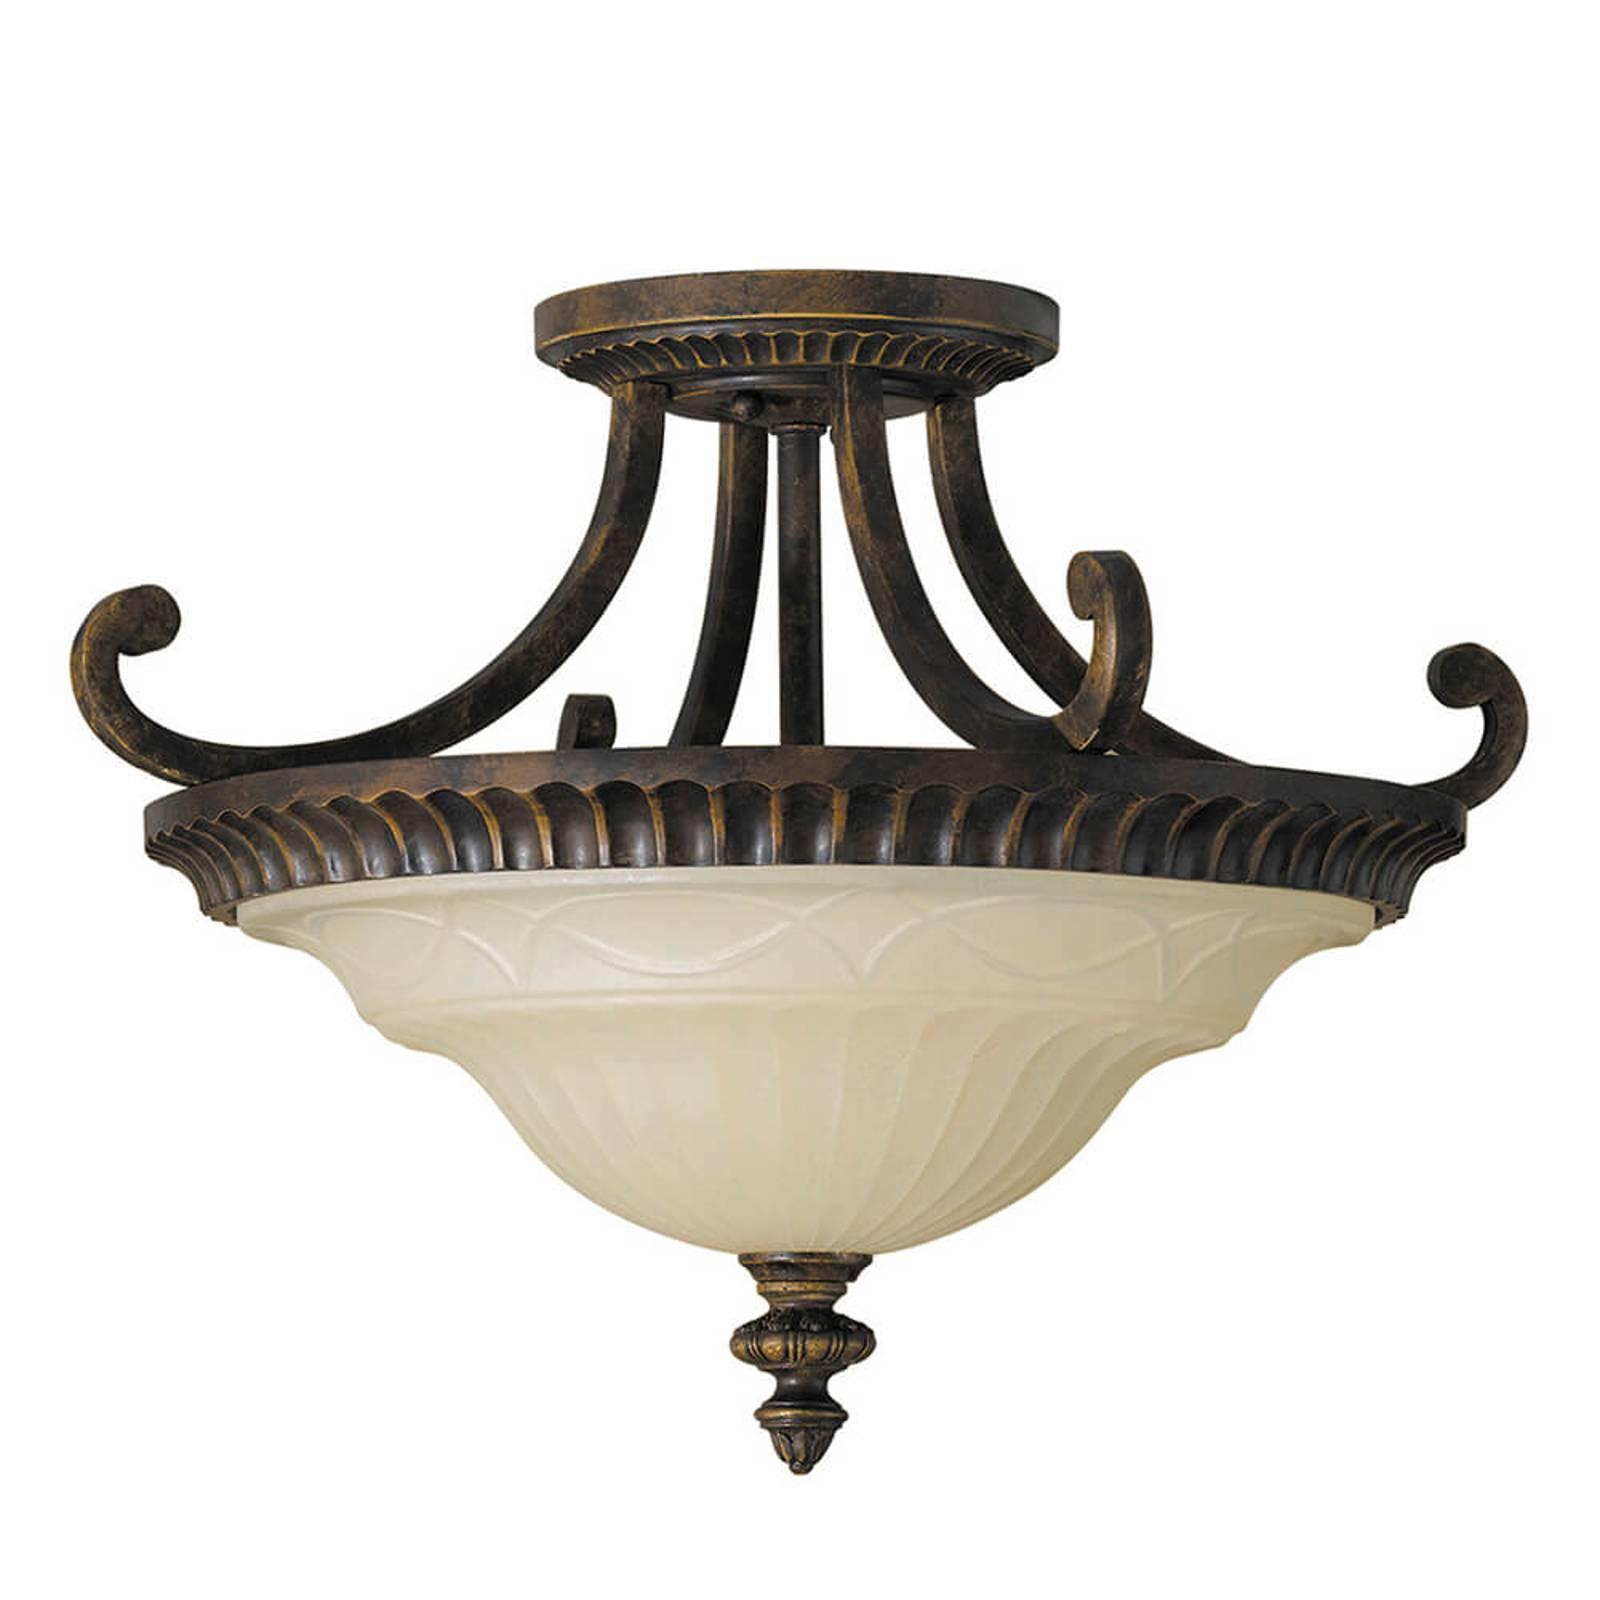 Plafondlamp met afstand Drawning Room, 43,8 cm